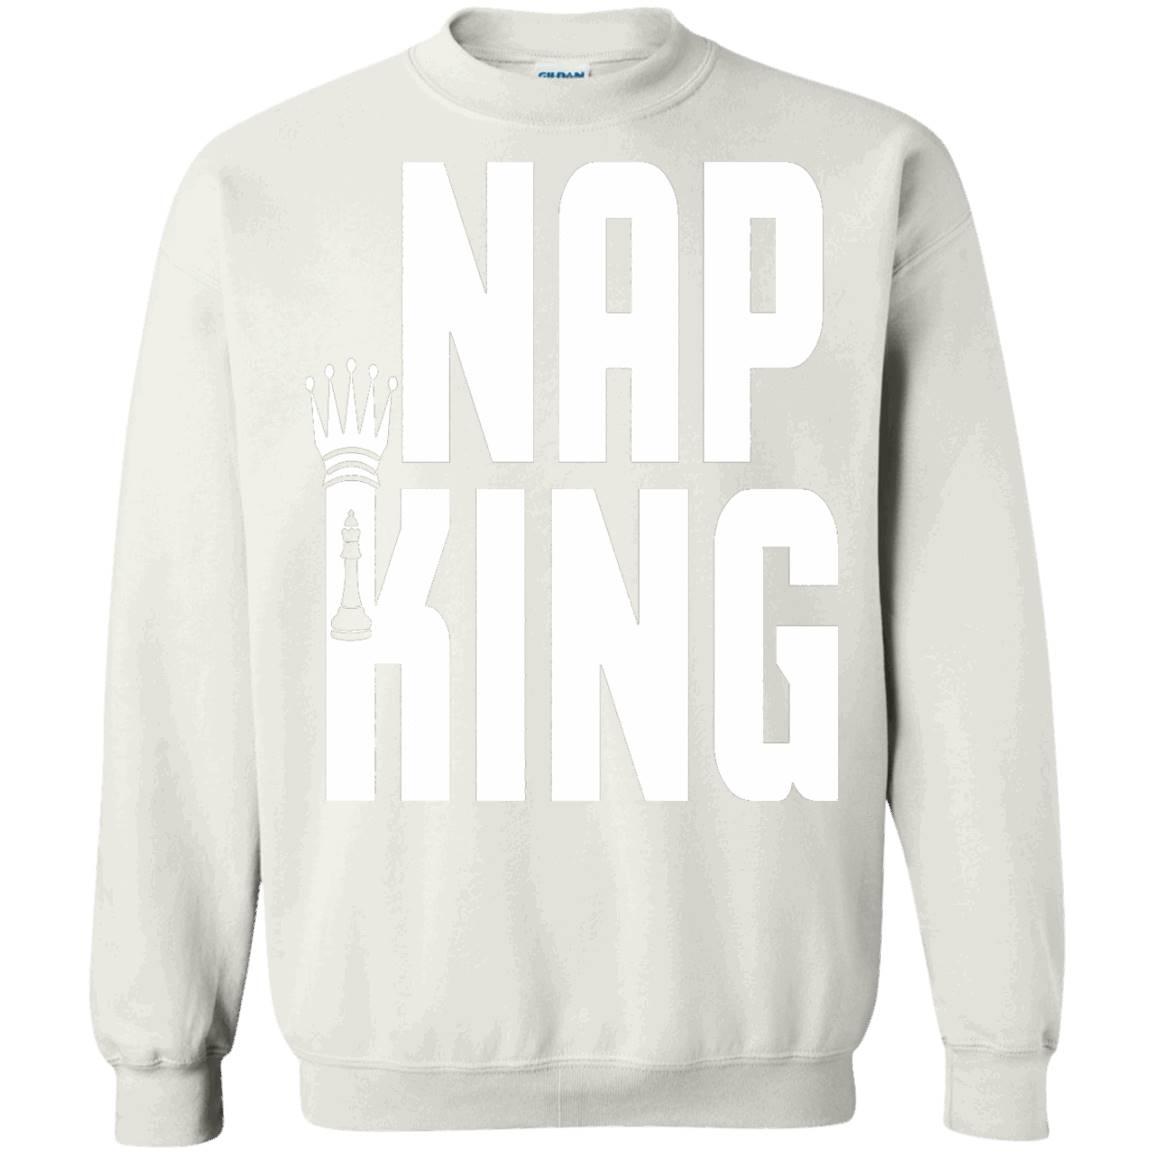 Nap King Funny t shirts – Sweatshirt